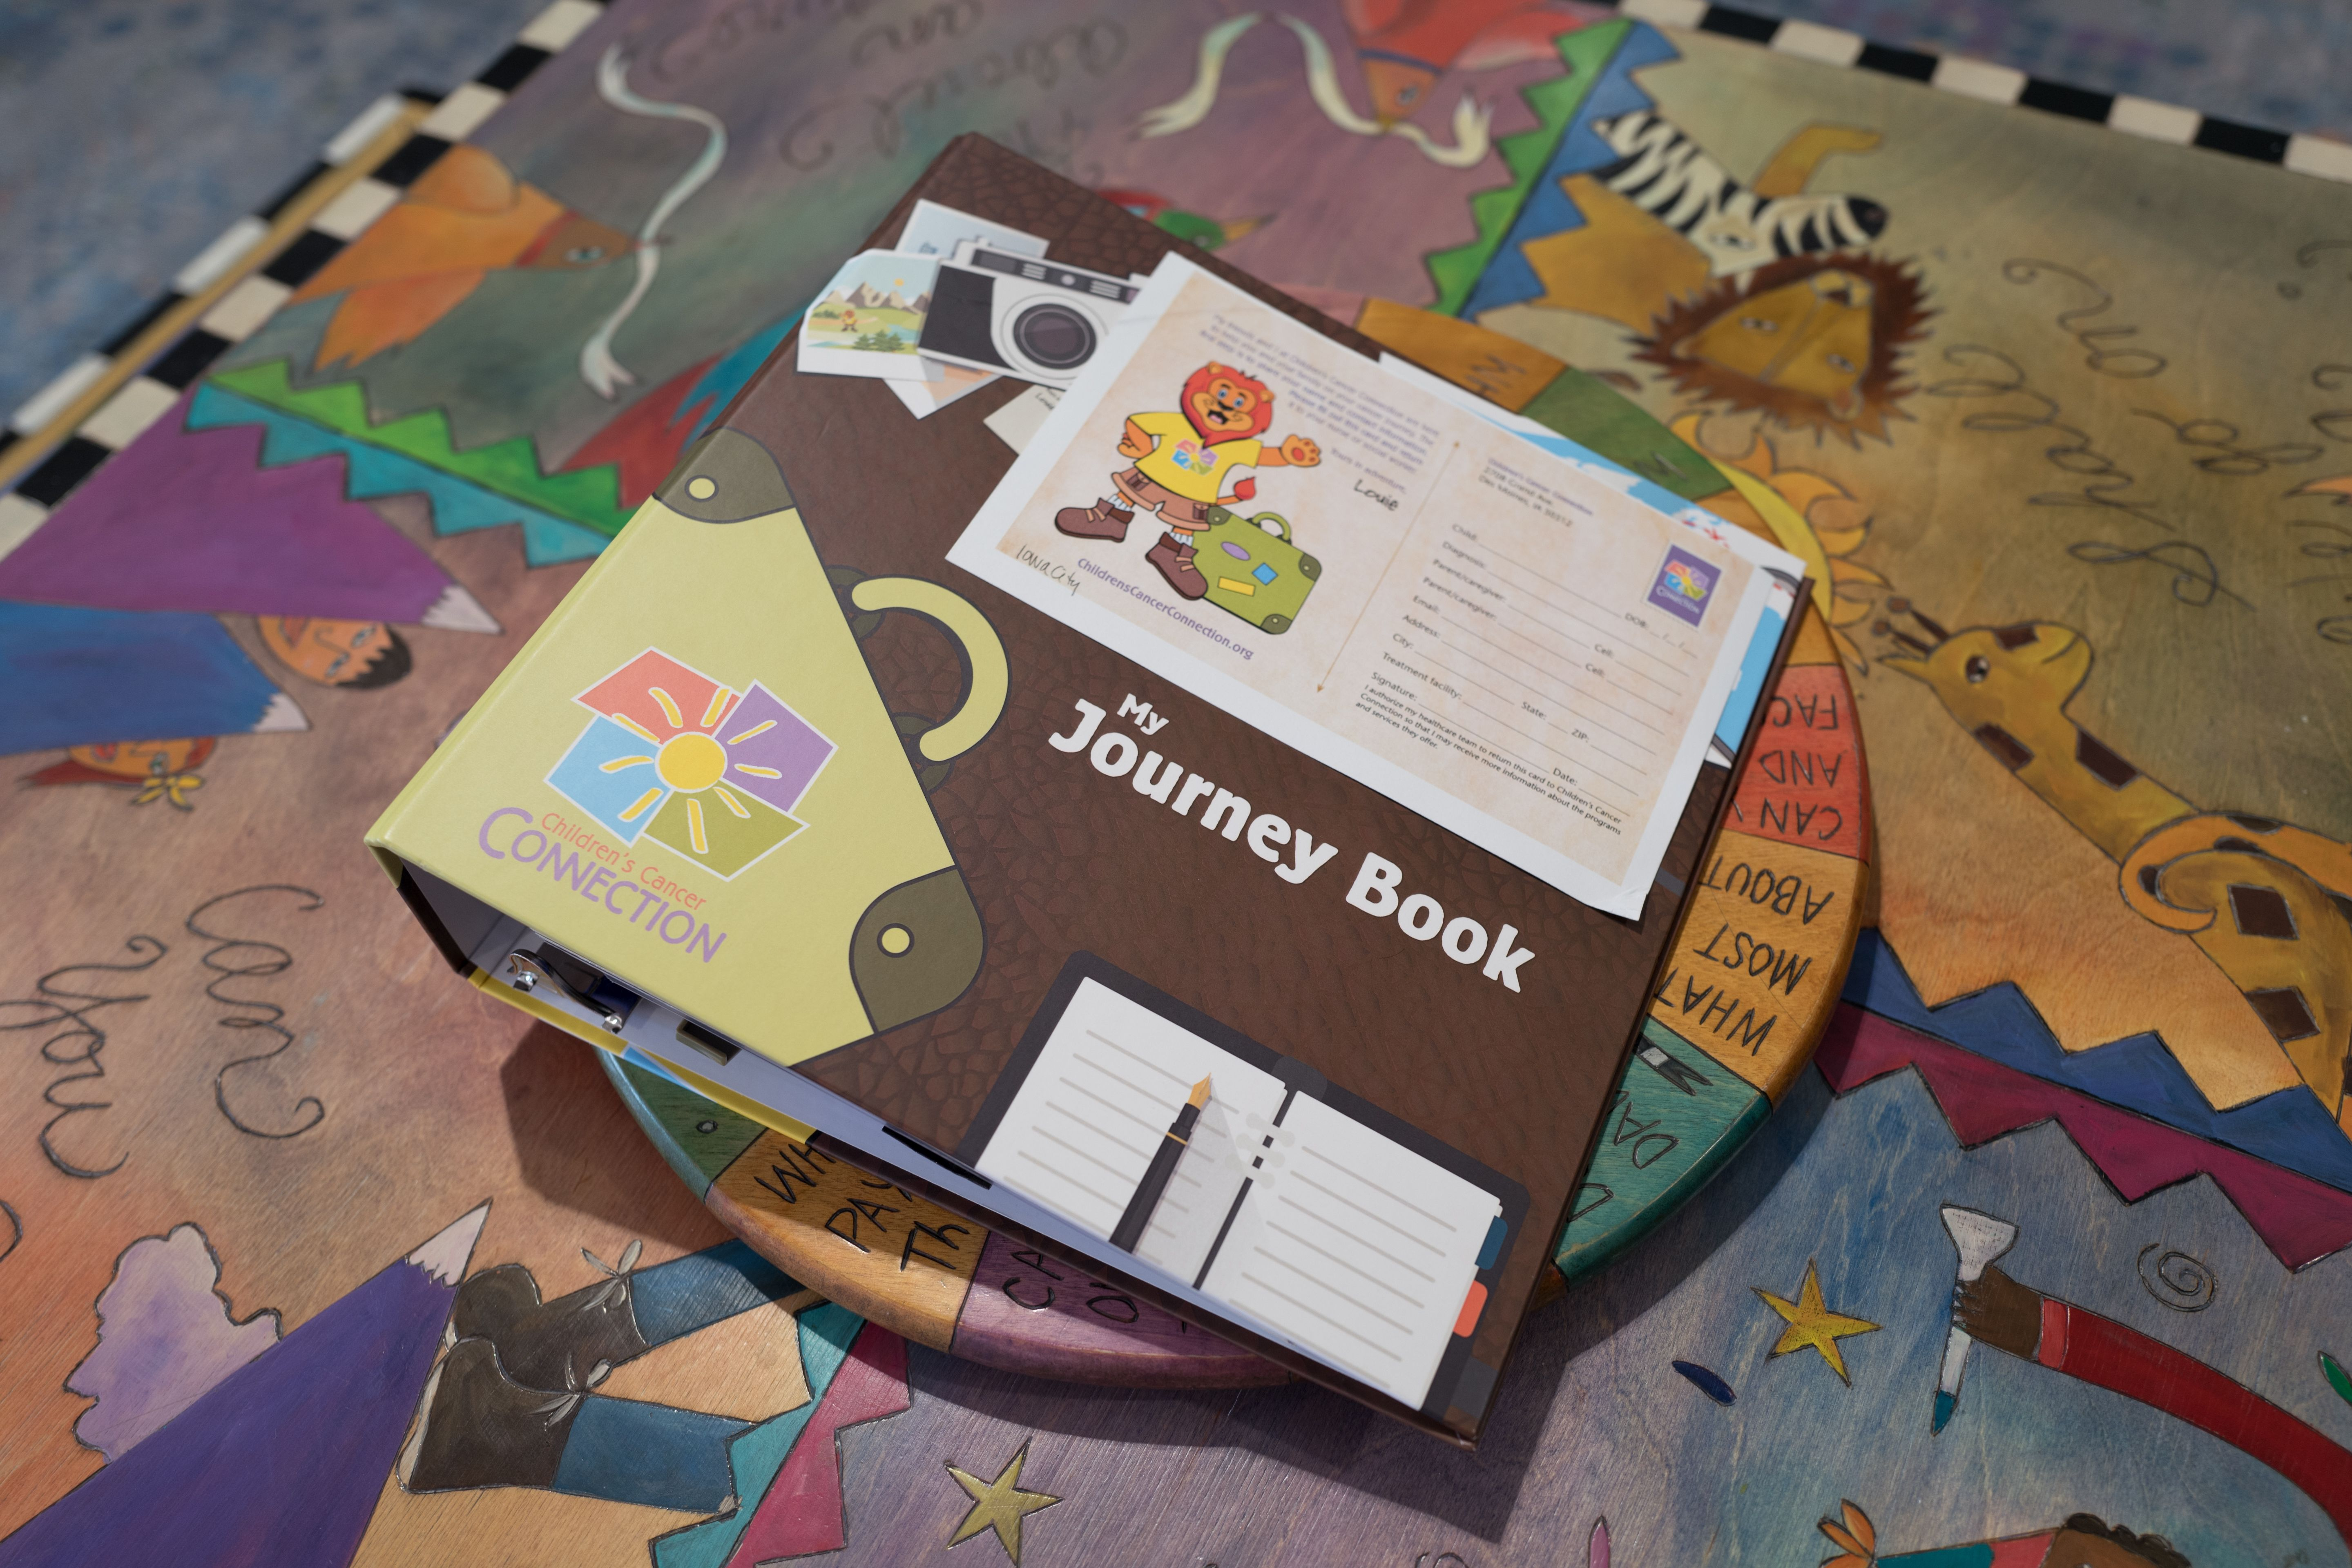 My Journey Book